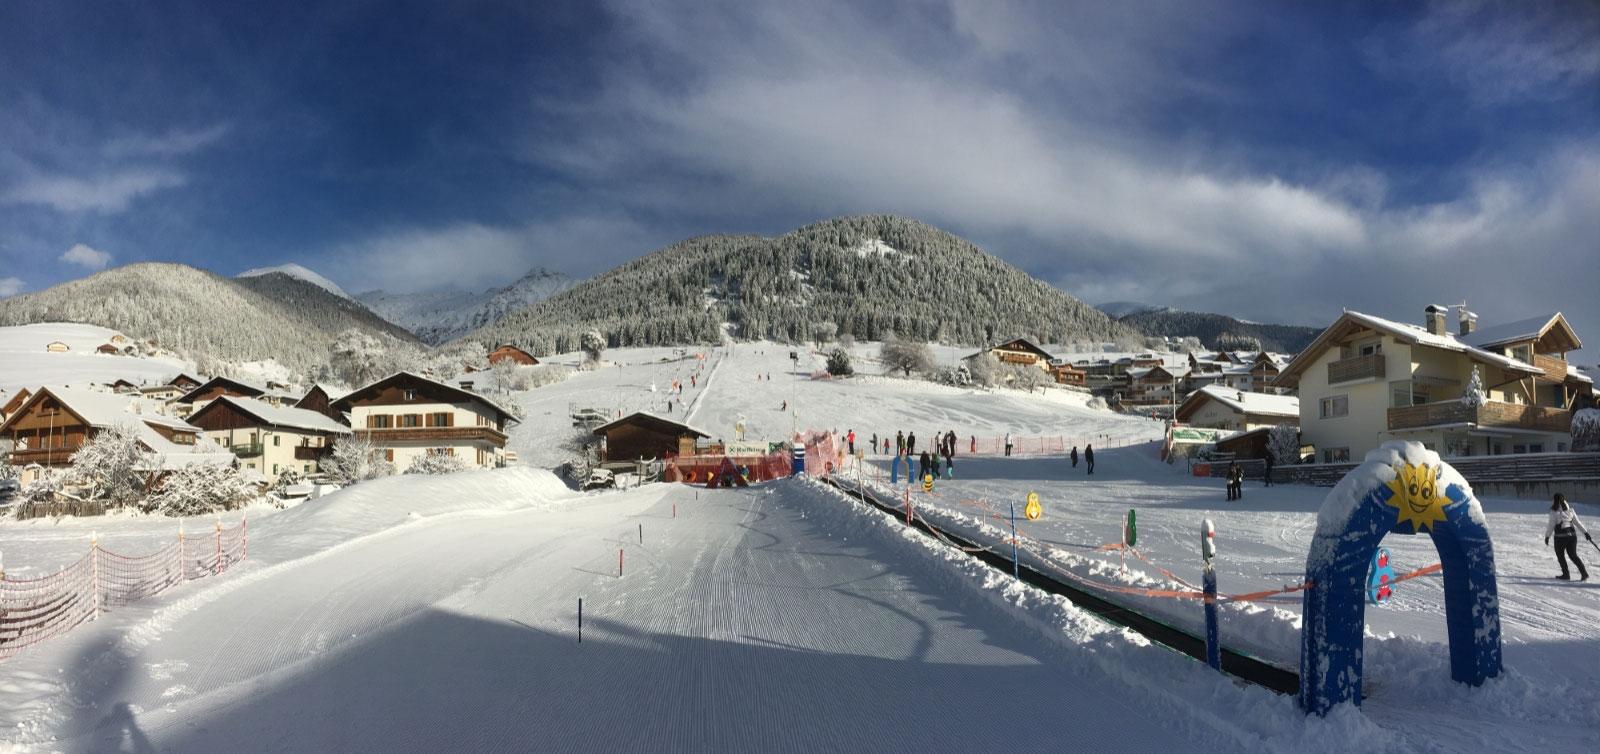 Christmas Village Ski Lift.Panorama Ski Lift The Sunny Ski Adventure Panorama Ski